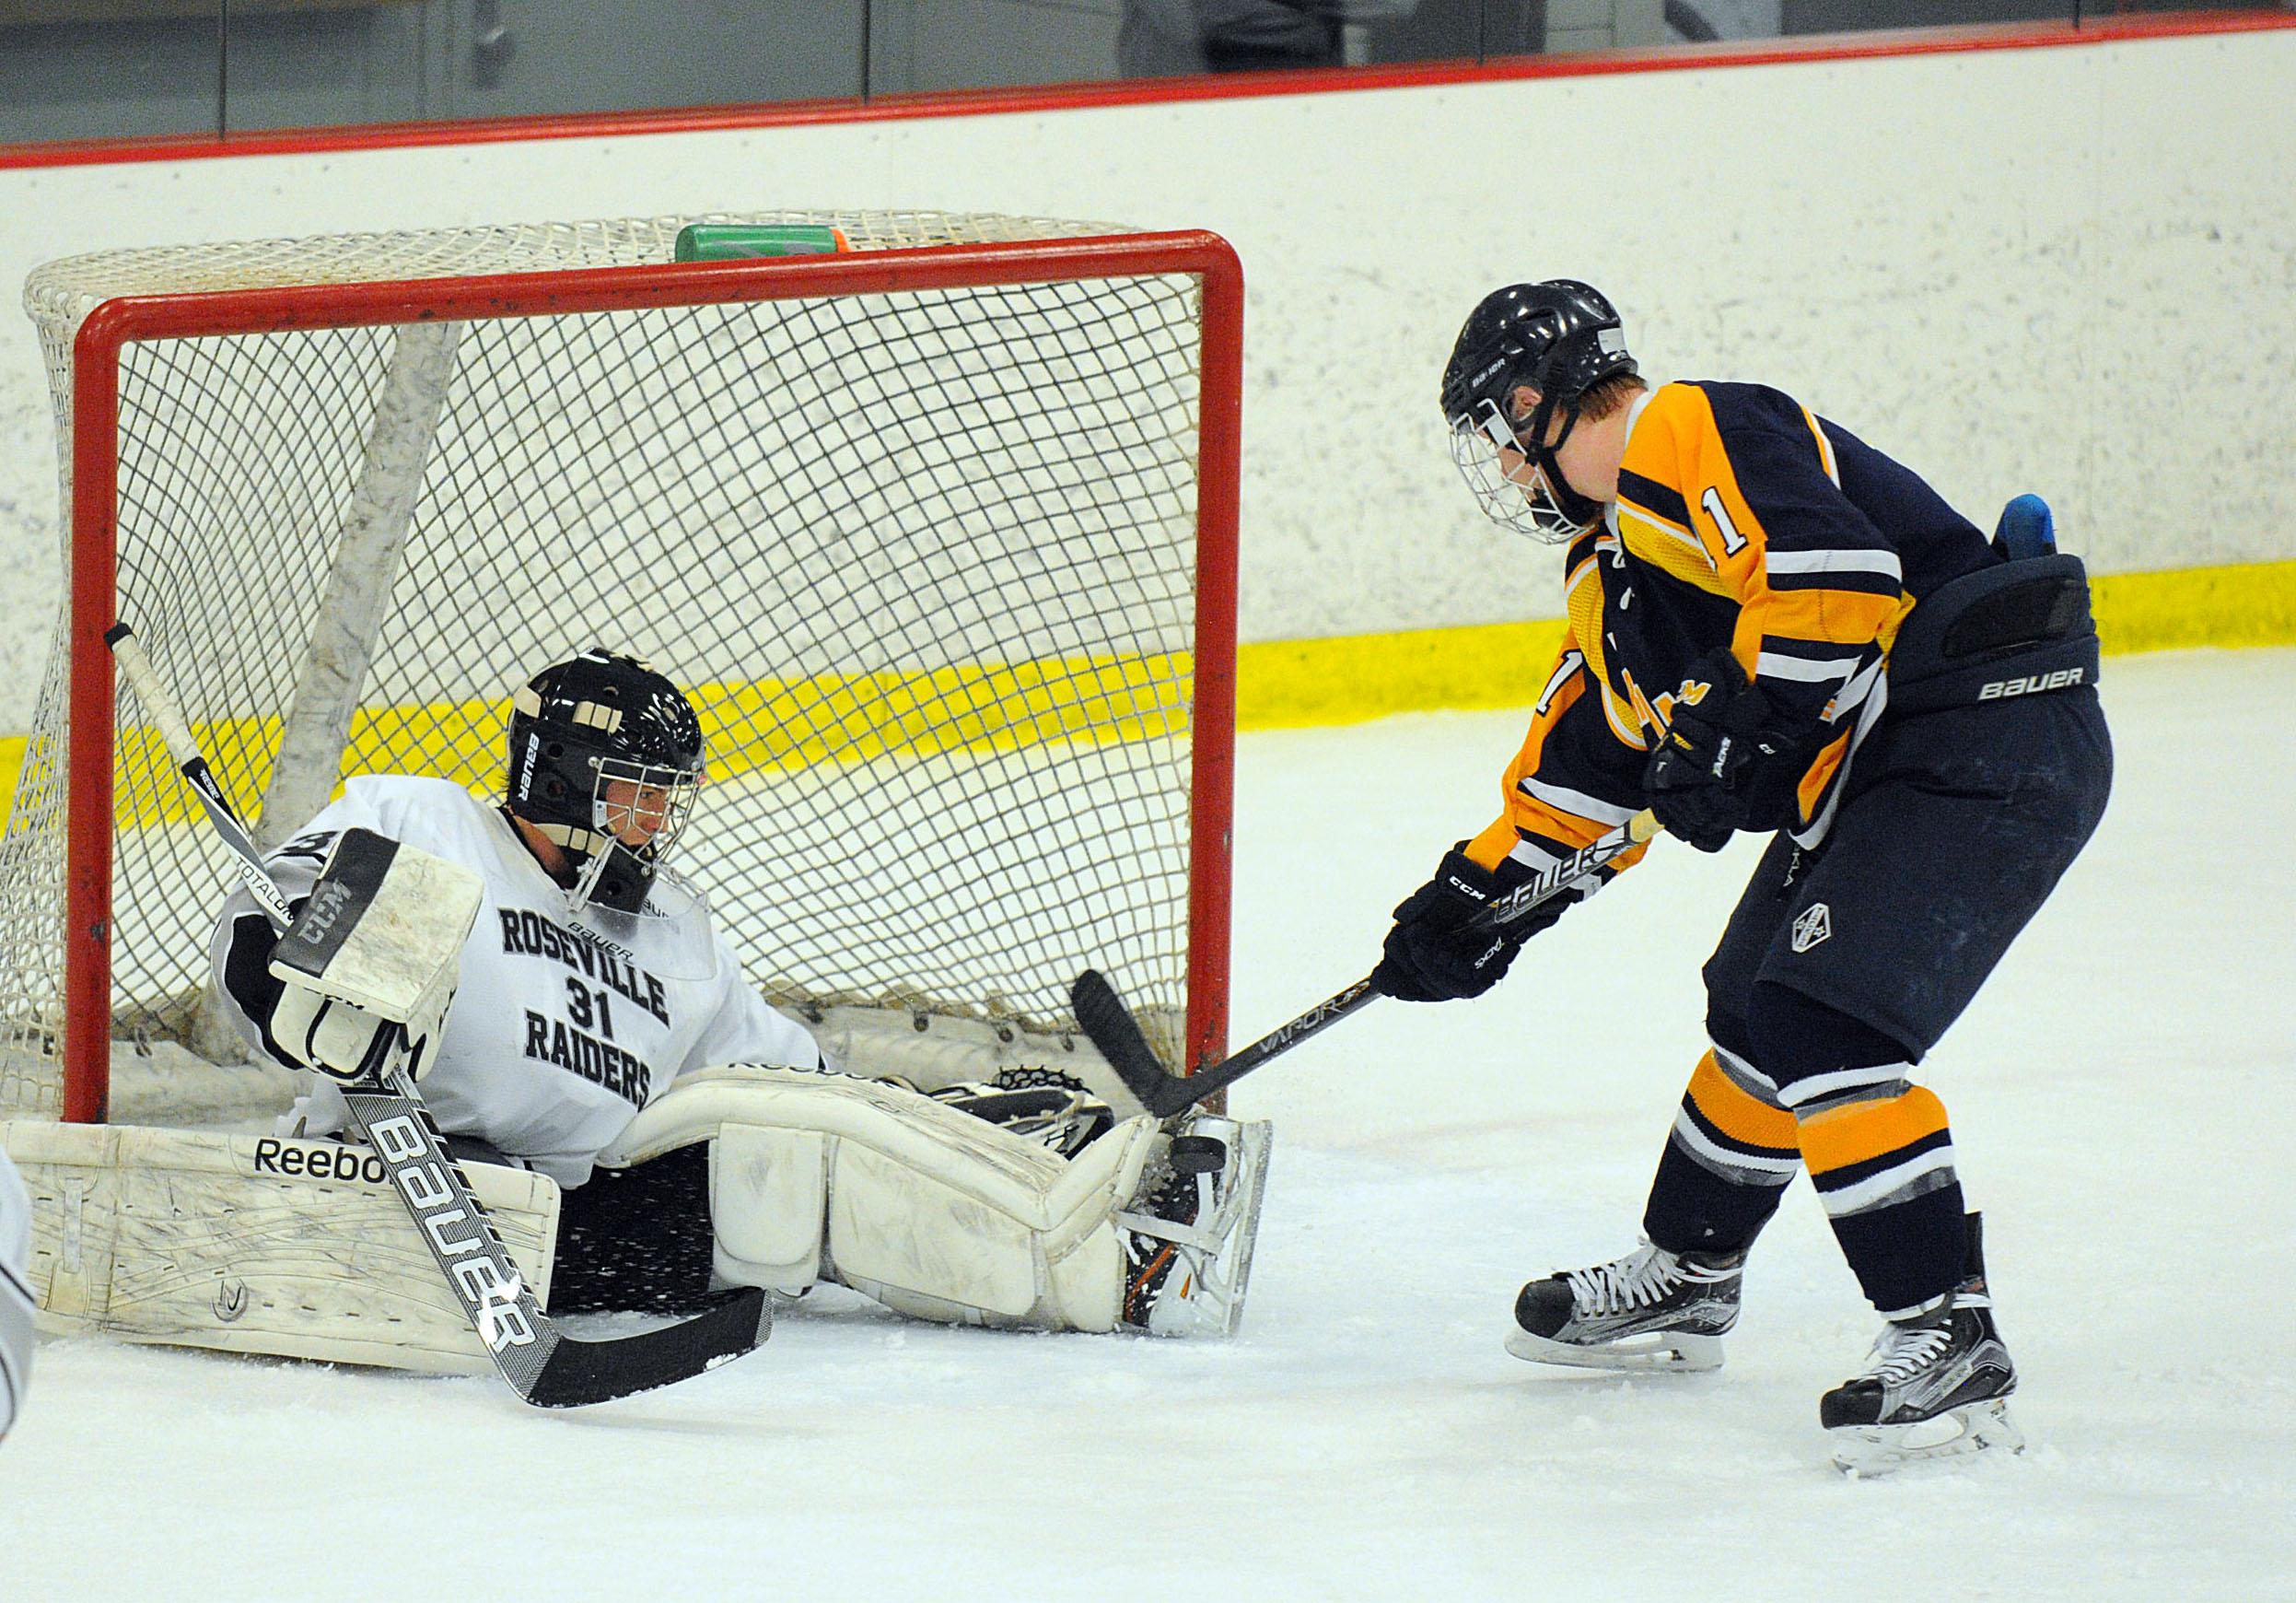 MN H.S.: Sandelin's Three Goals Helps Hermantown Hold Off Roseville